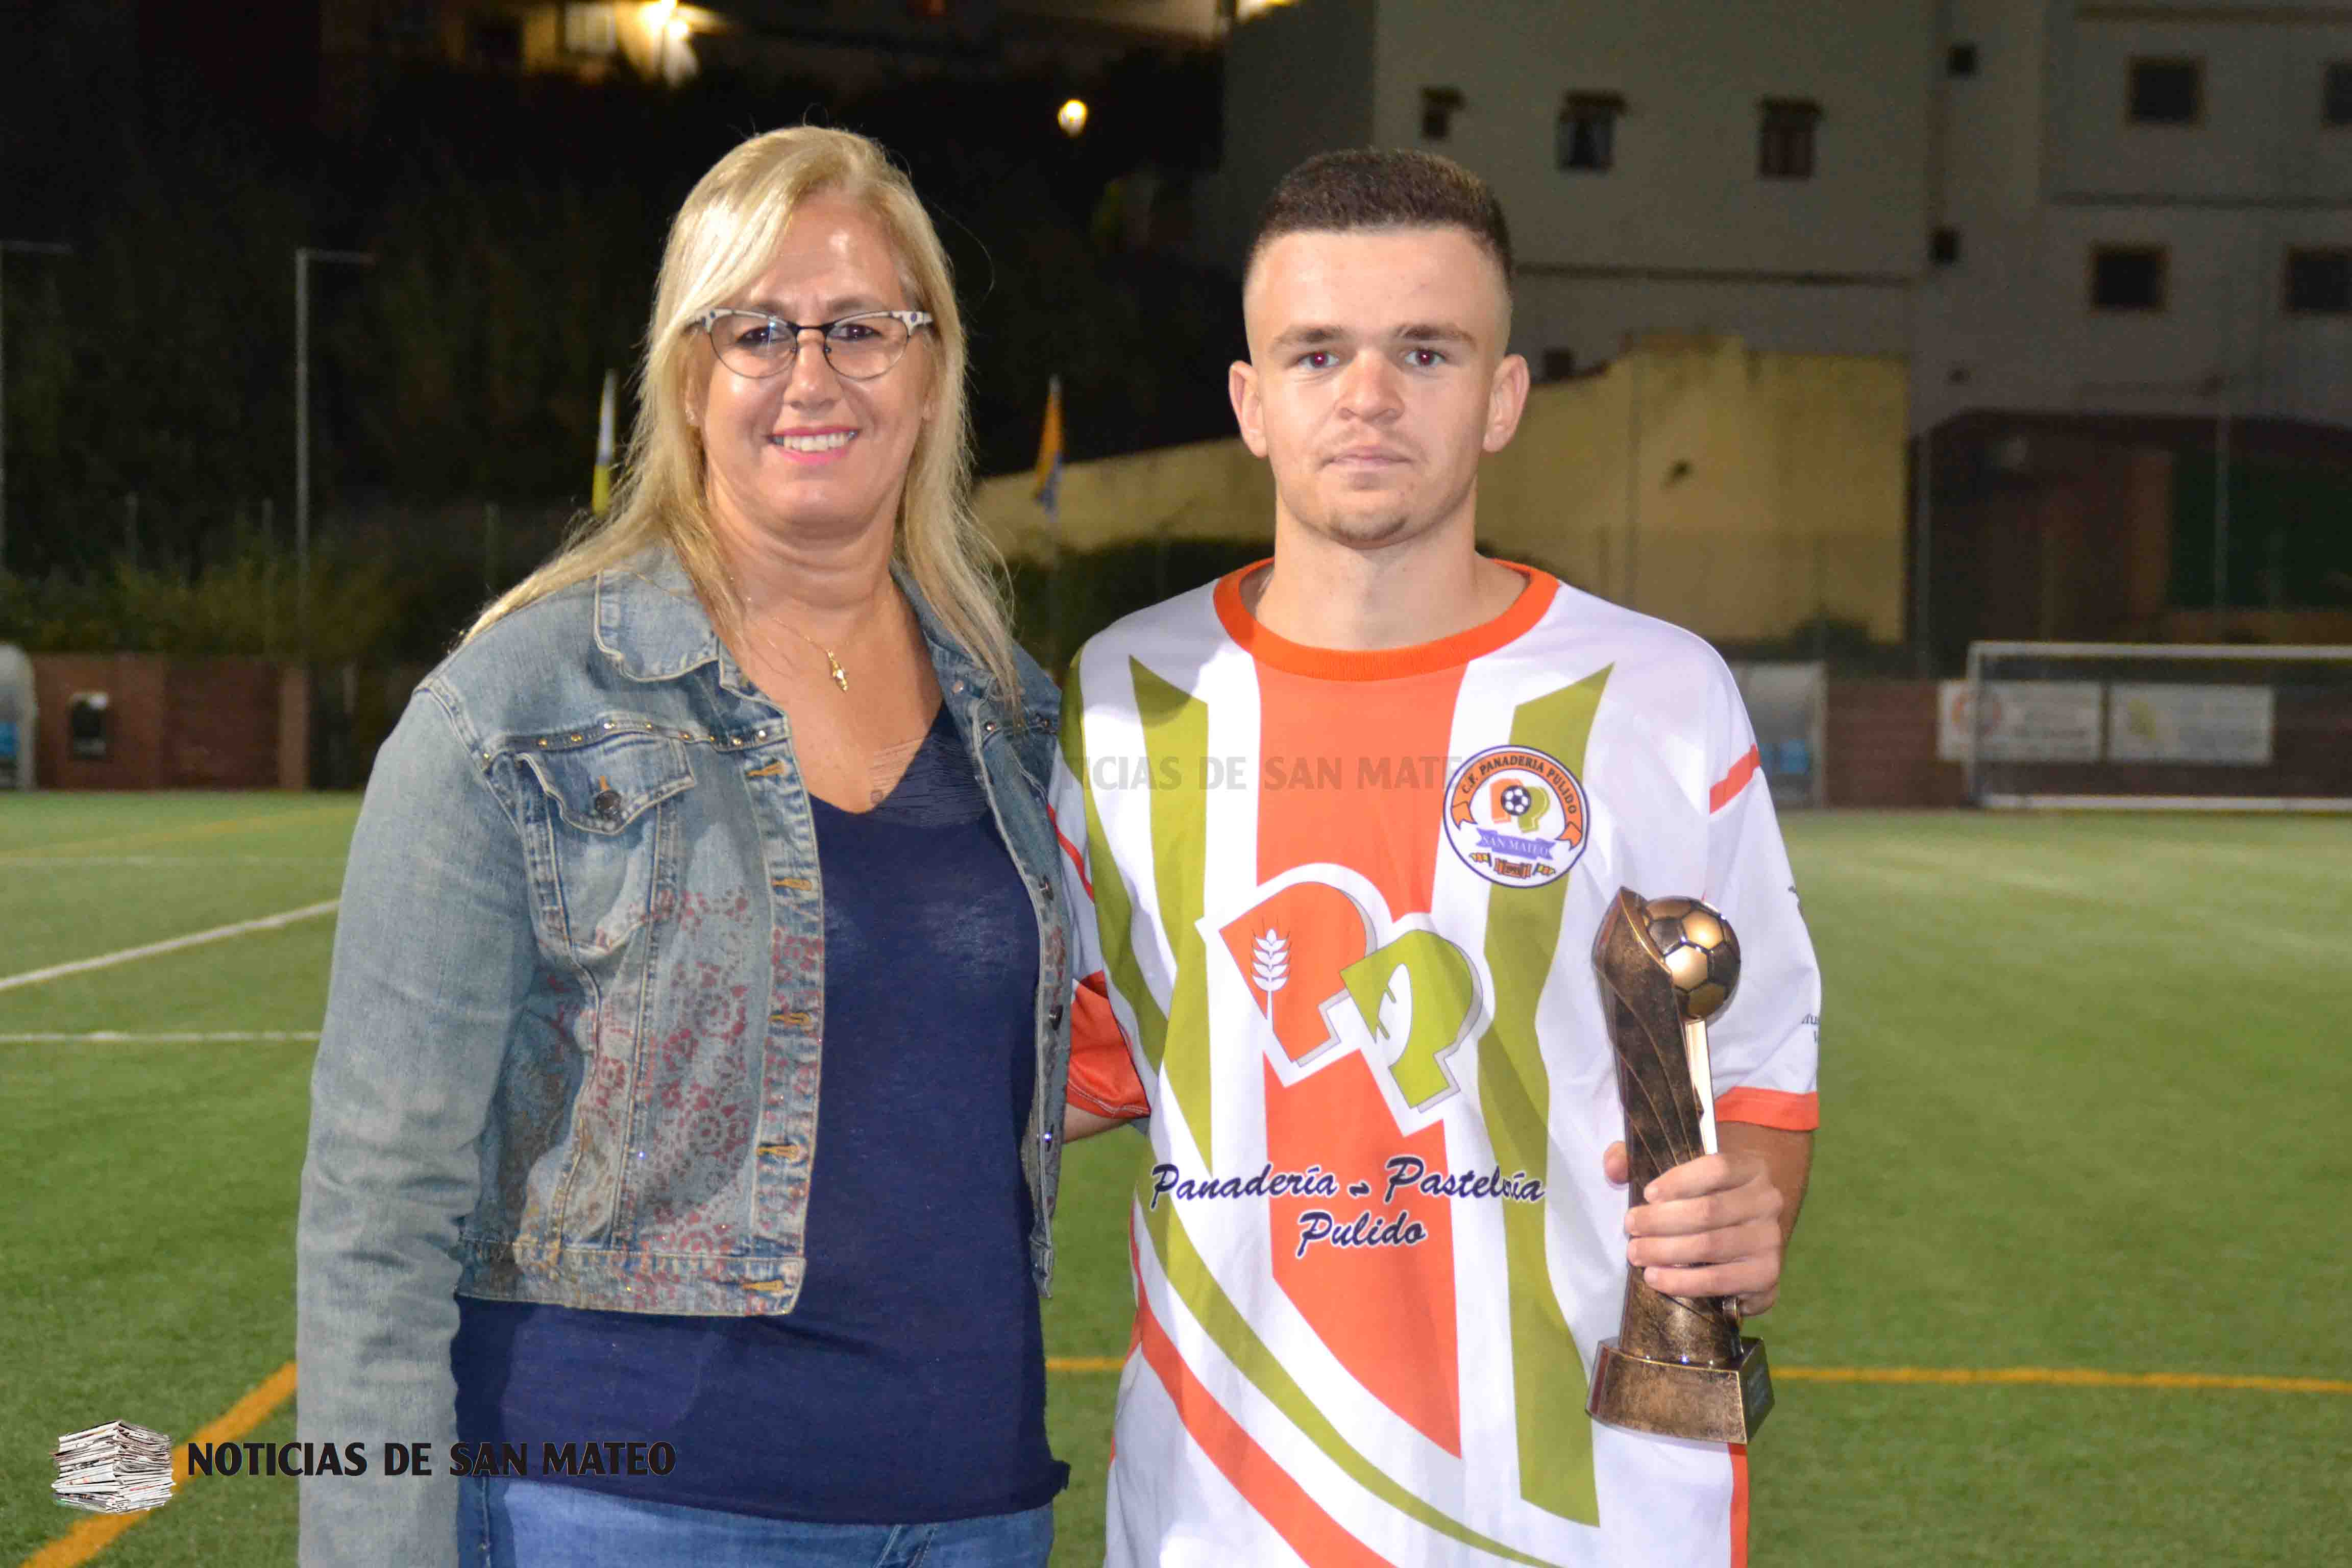 Sofia entregando premio al Pulido Triangular juvenil 5 sept 2018 Foto Laura Miranda Noticias de San Mateo